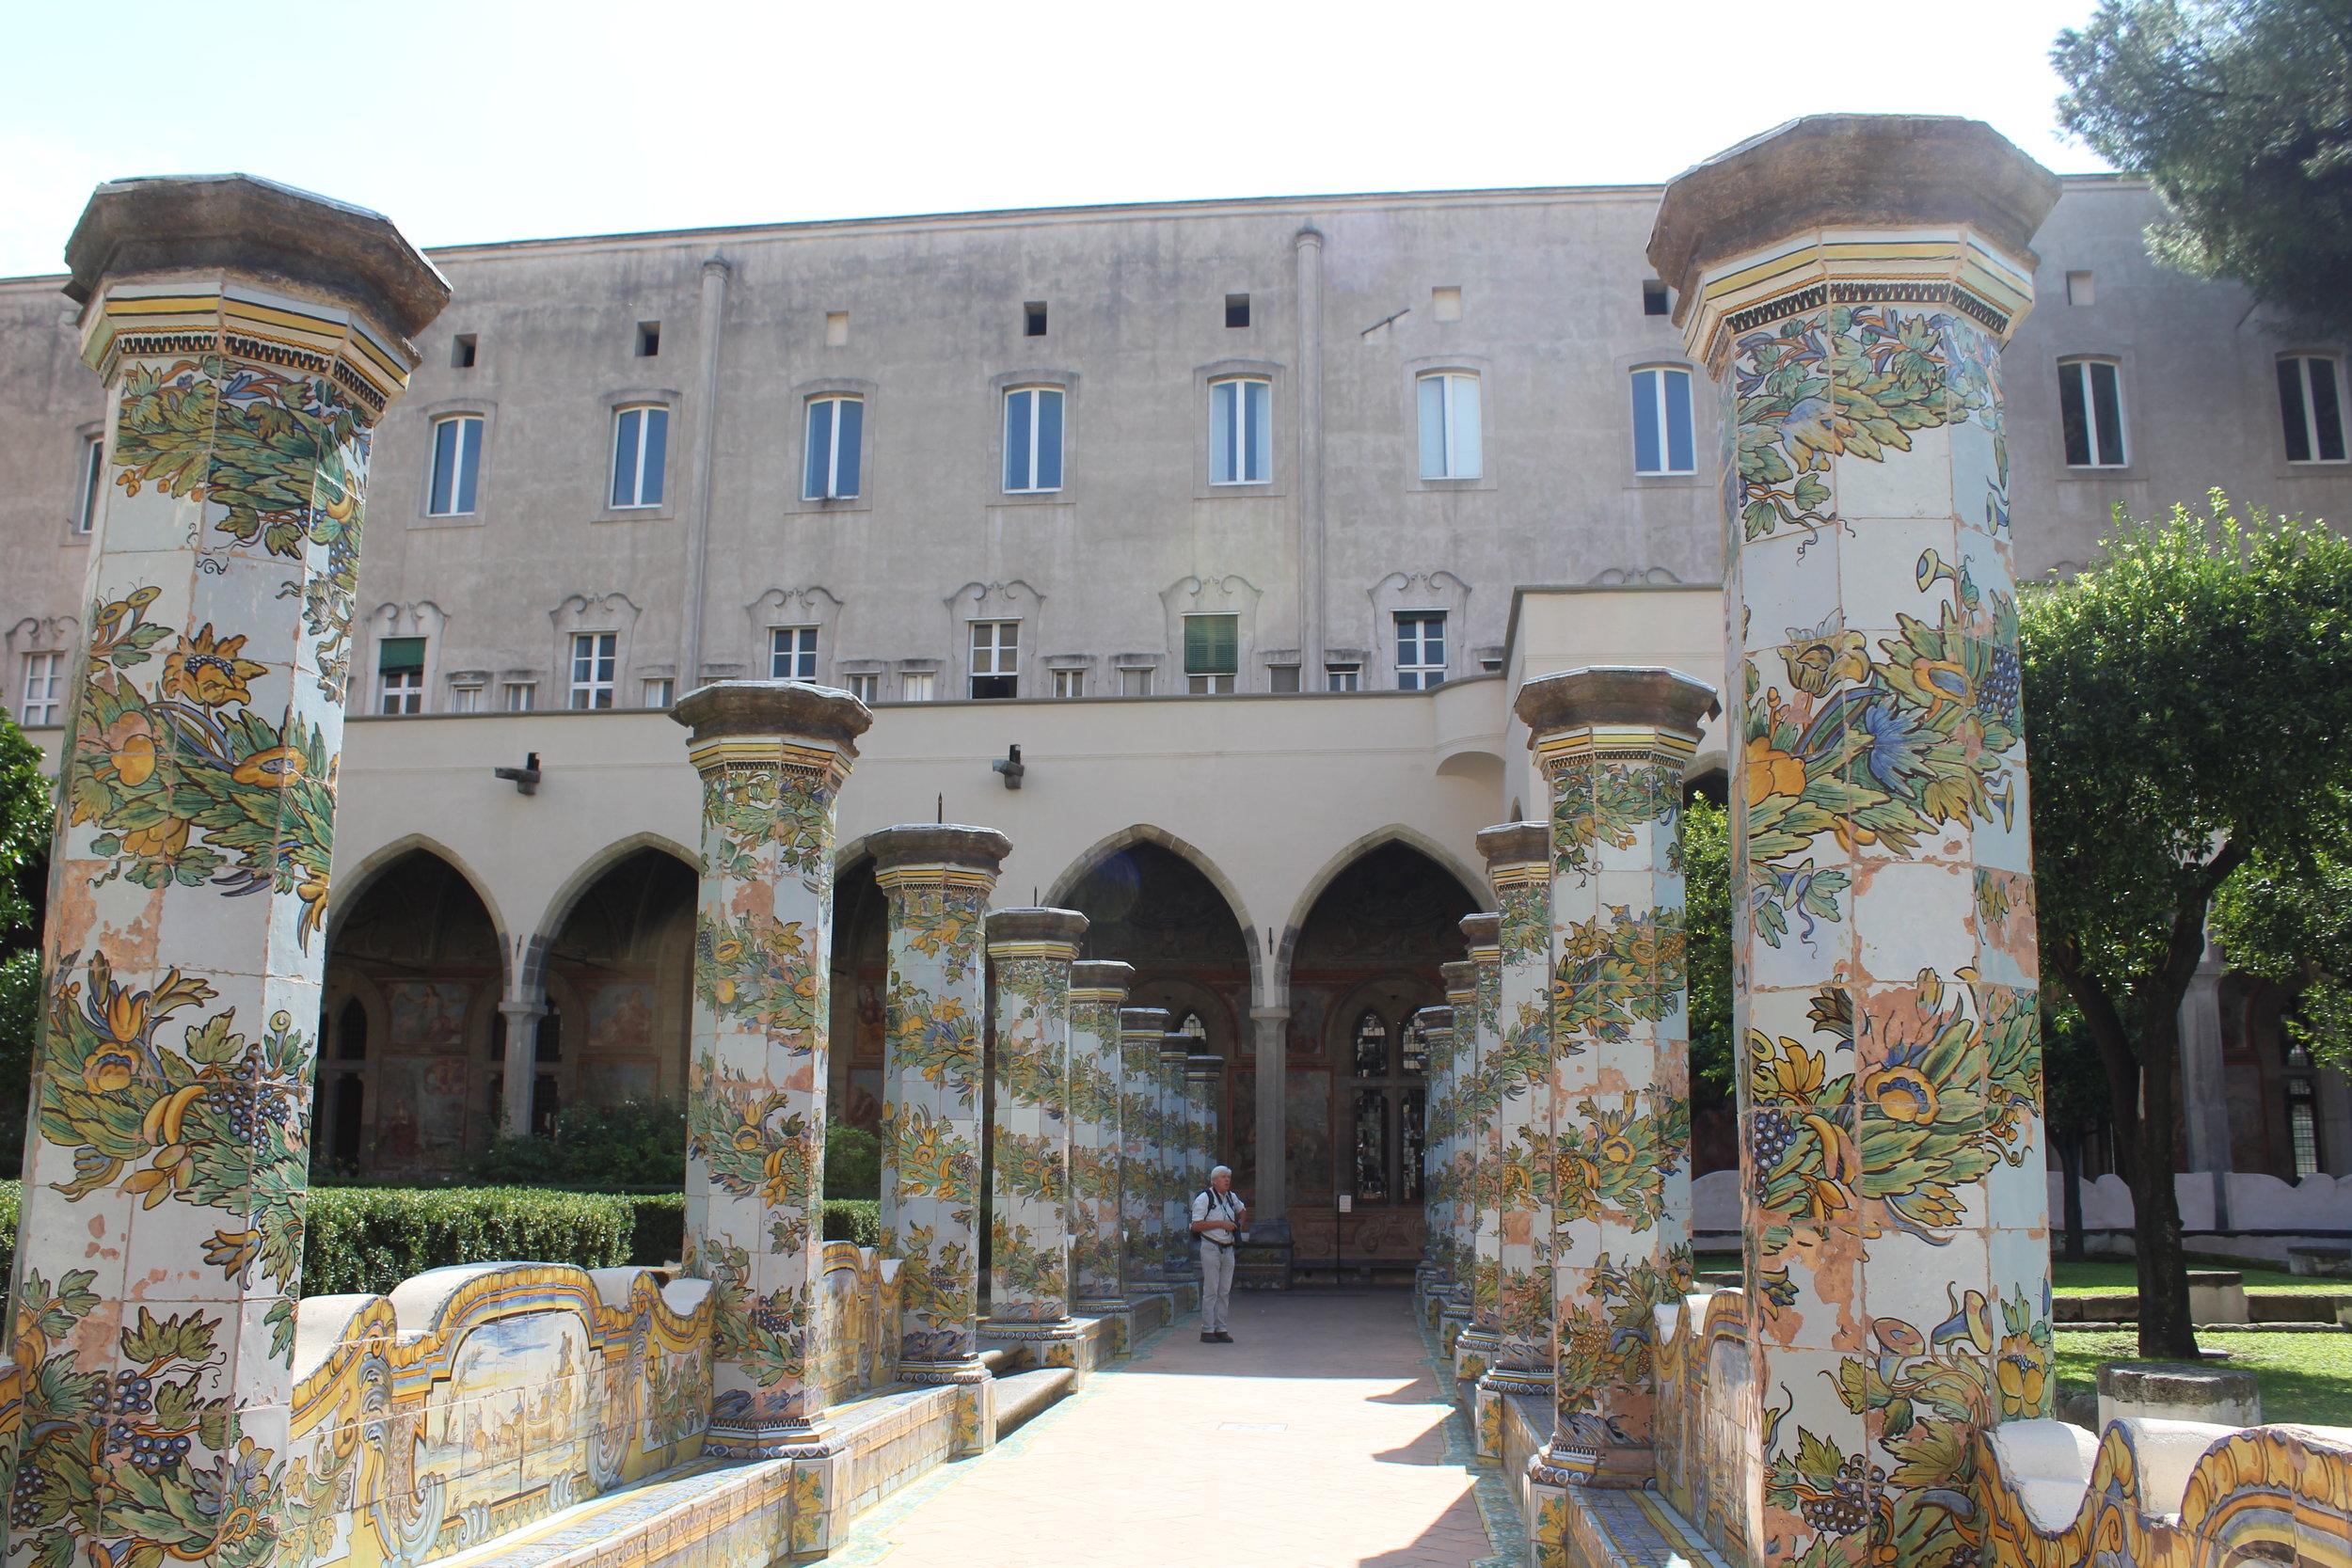 Majolica cloister of Santa Chiara